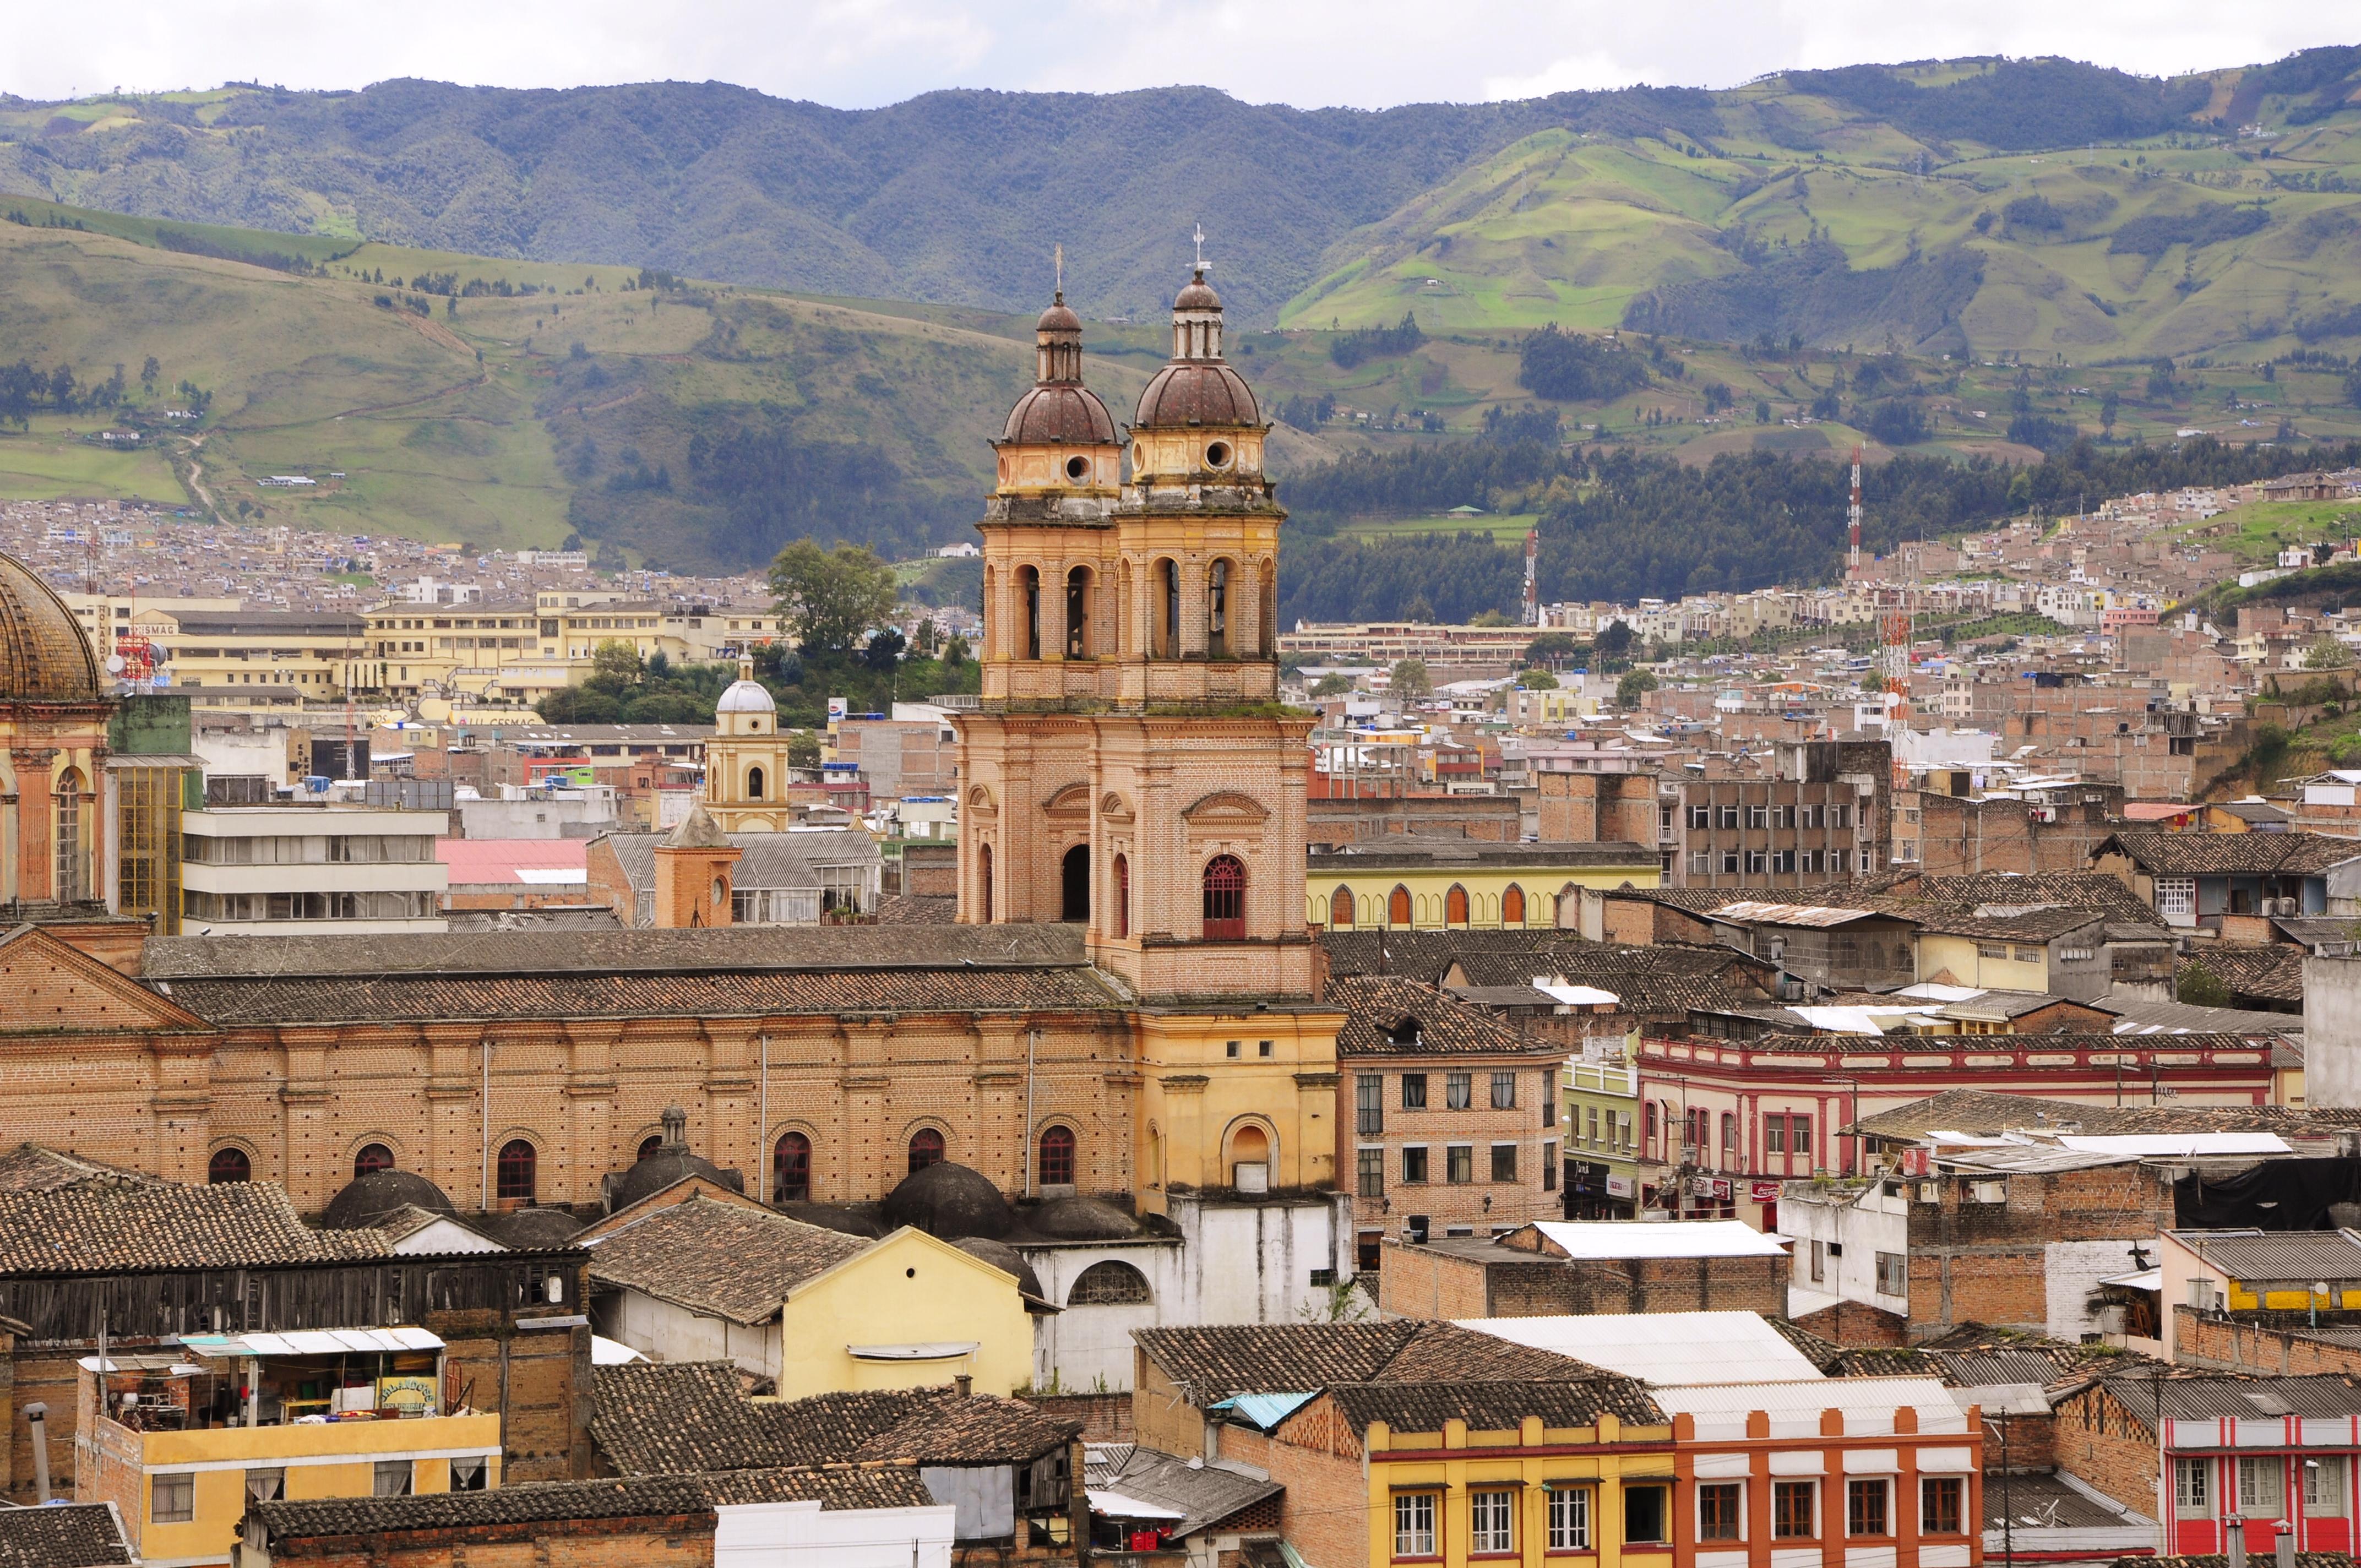 Recopilacion... Catedrales e iglesias Colombianas